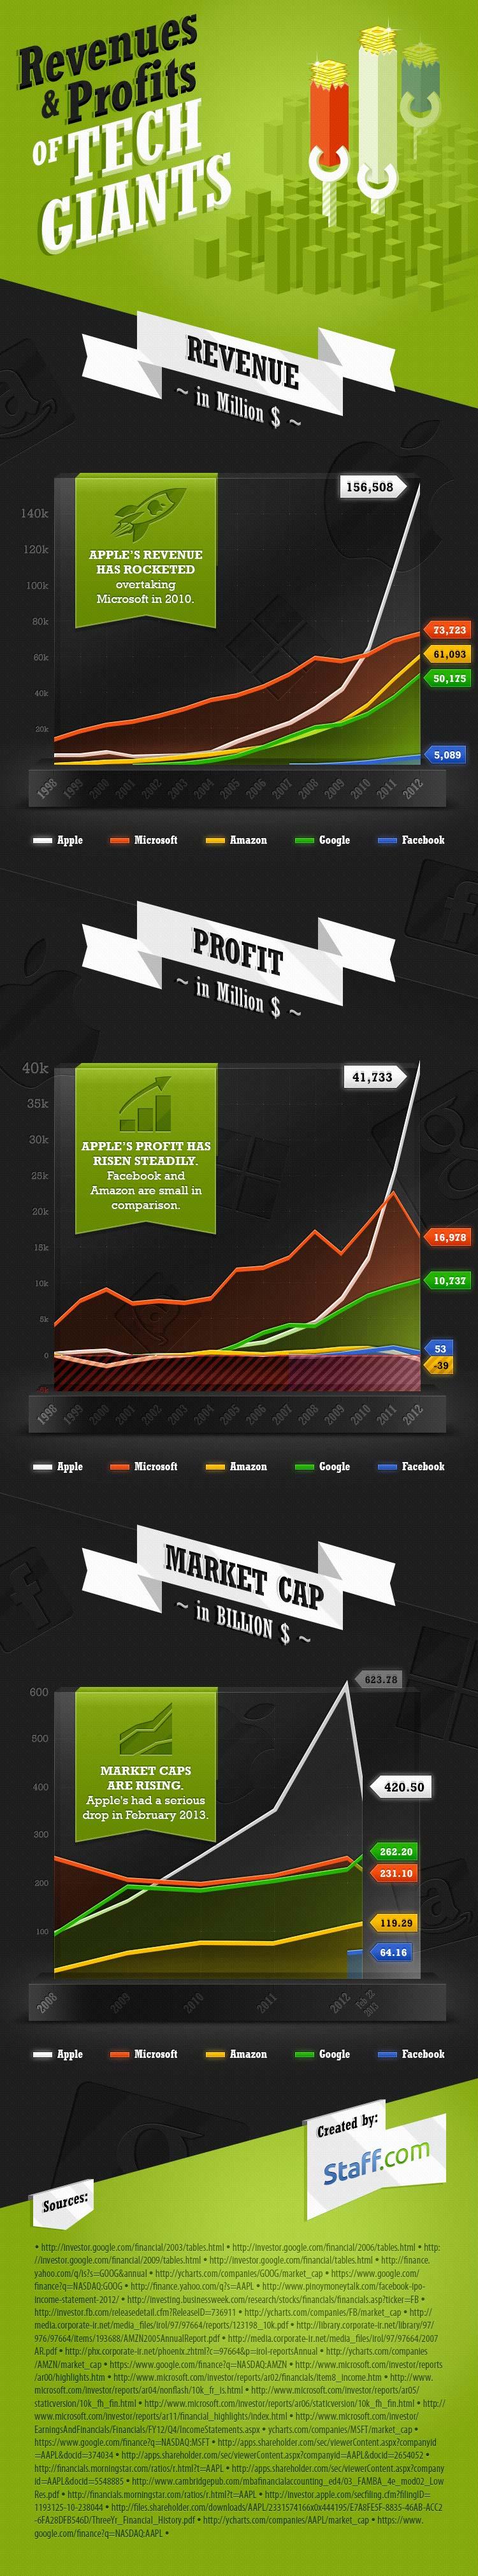 Tech Companies Profits 2012-Infographic